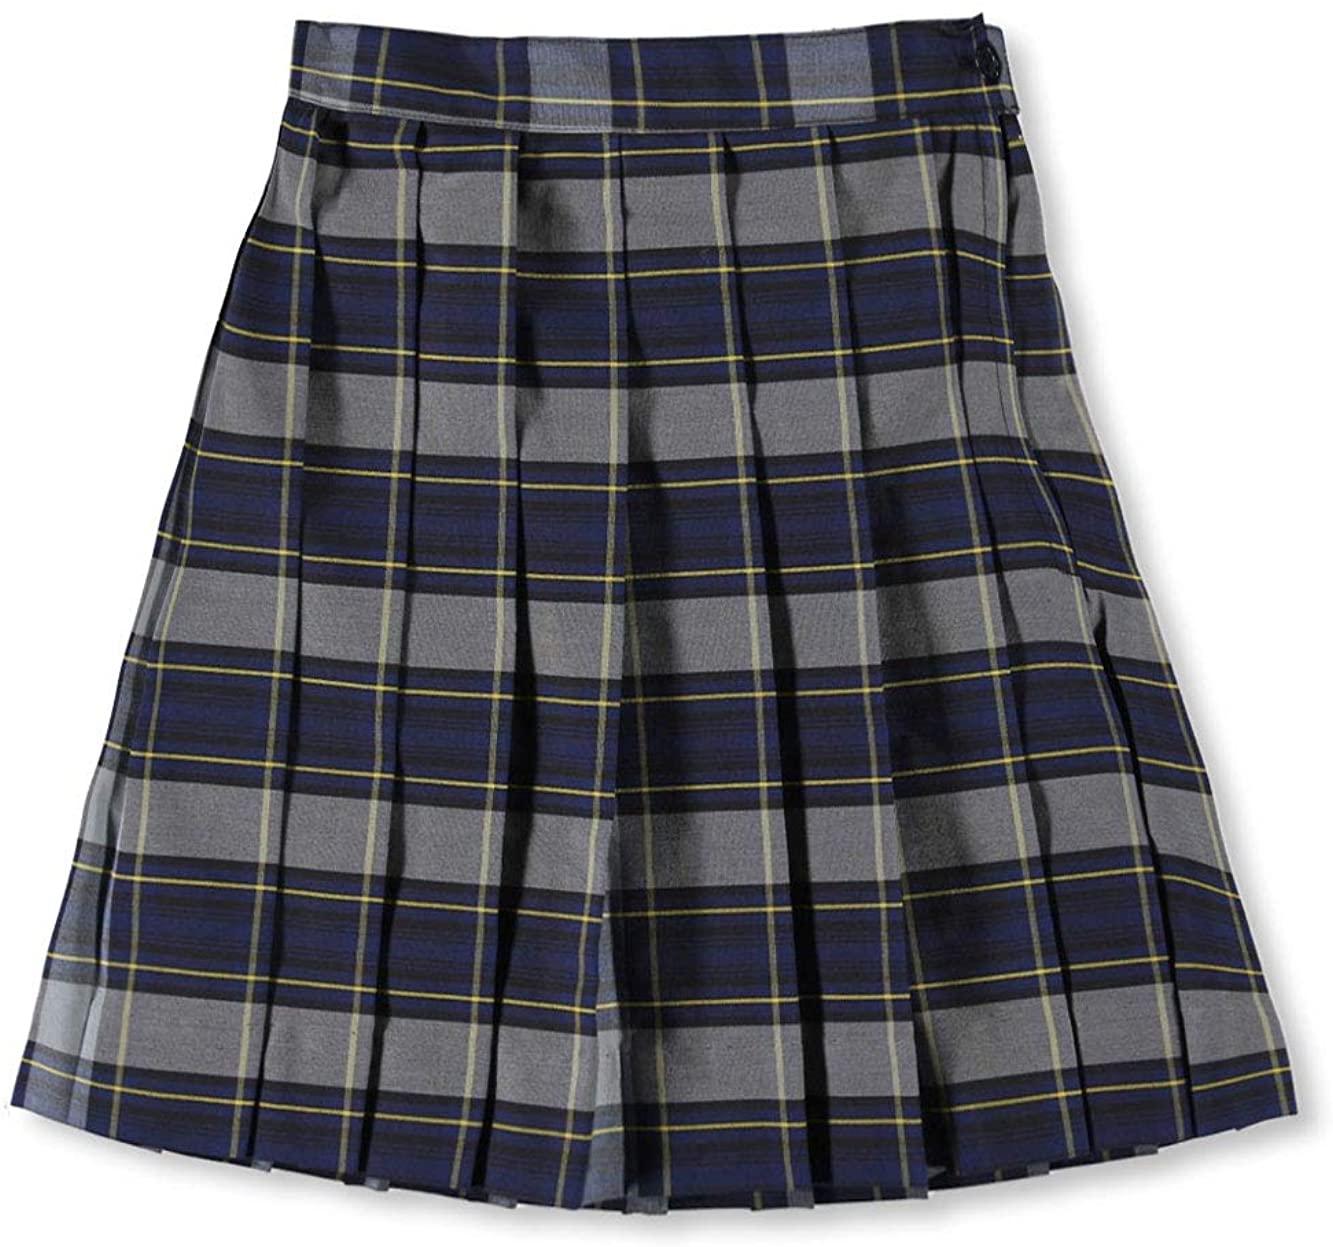 Cookie's Big Girls' Pleated Skirt - Royal/lt. Blue/goldplaid #57, 20